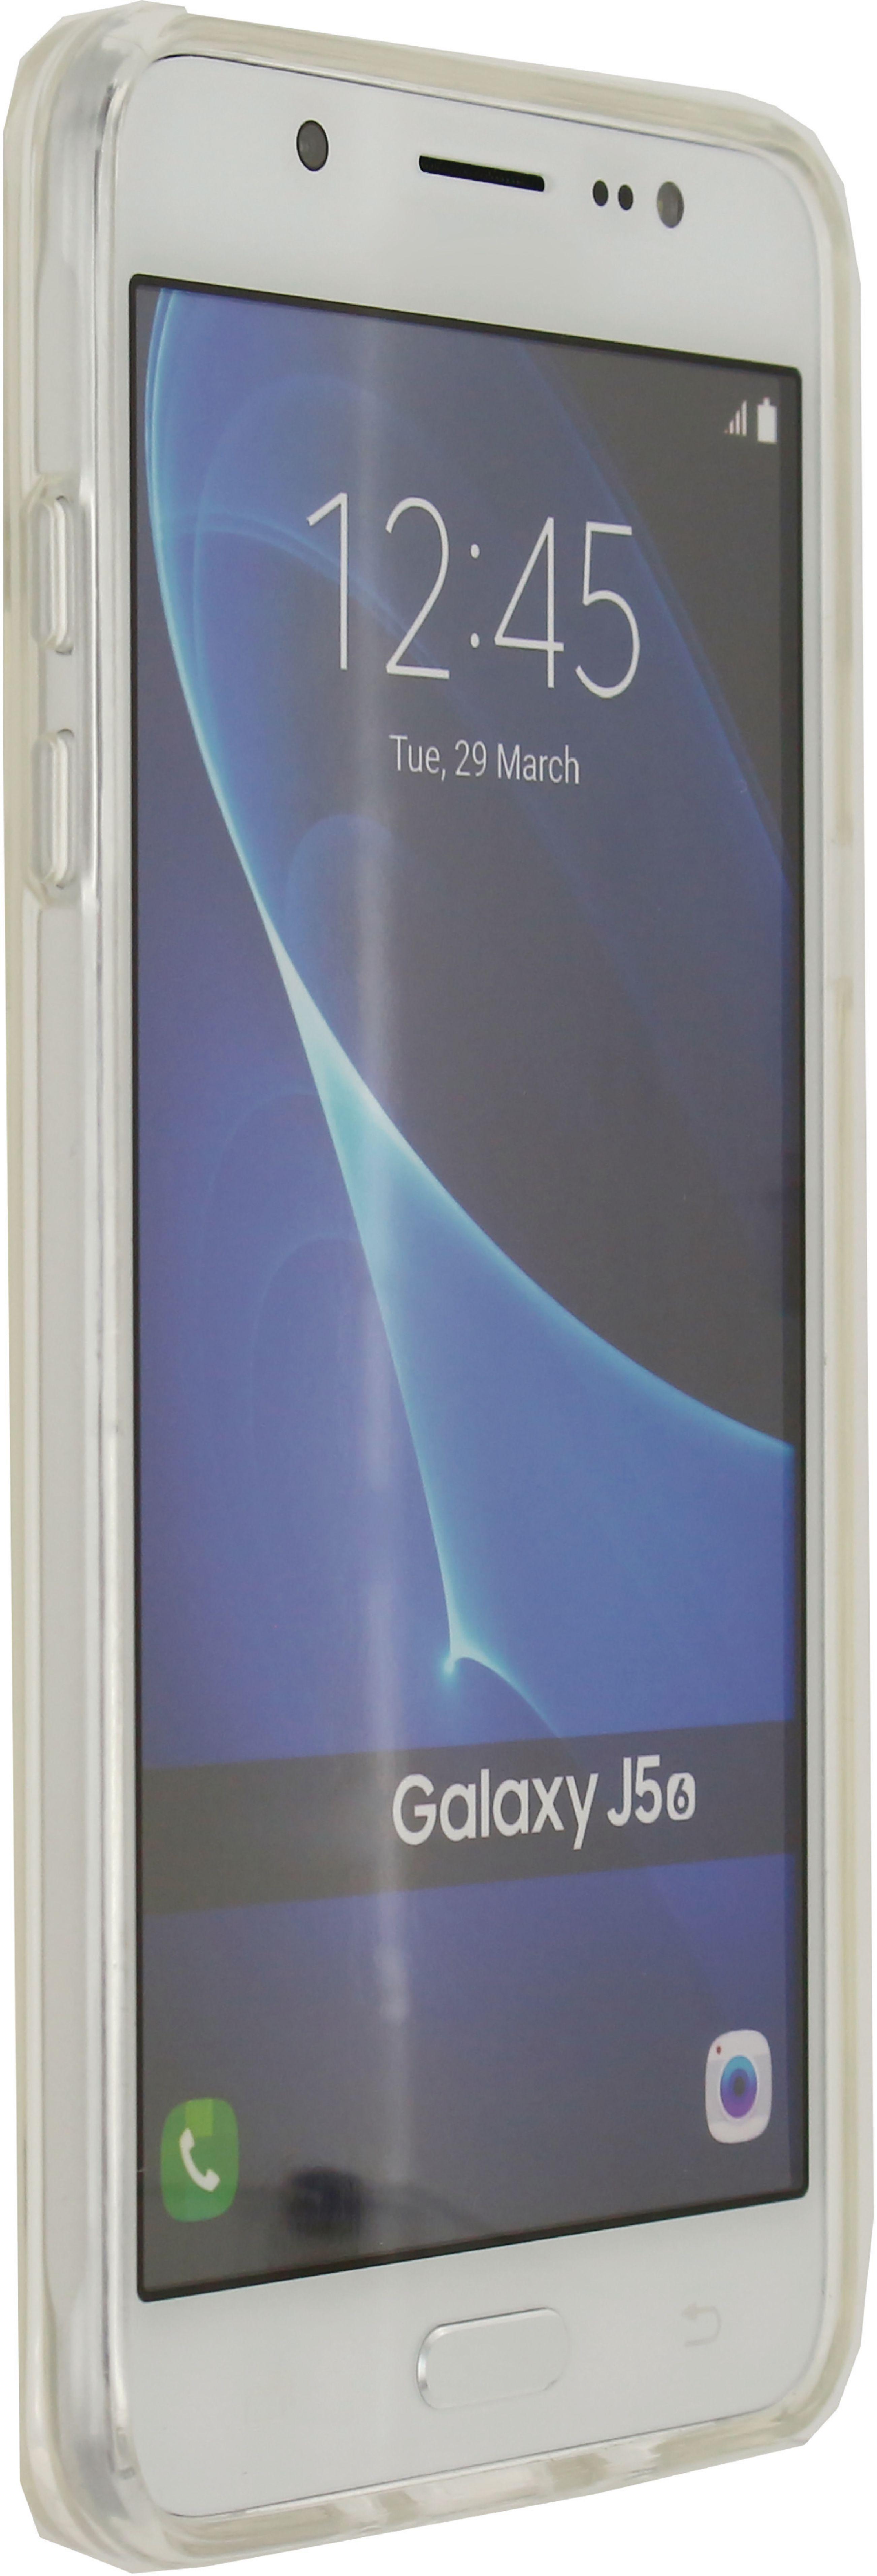 Image of   Telefon Transparent Beskyttelsesetui Samsung Galaxy J5 2016 Gennemsigtig